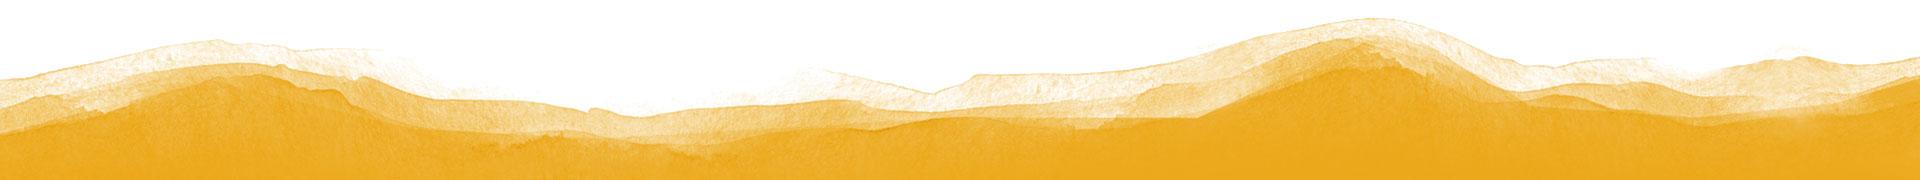 Clearwater-Farm-Divider-Organic-Dairy-Honey.jpg